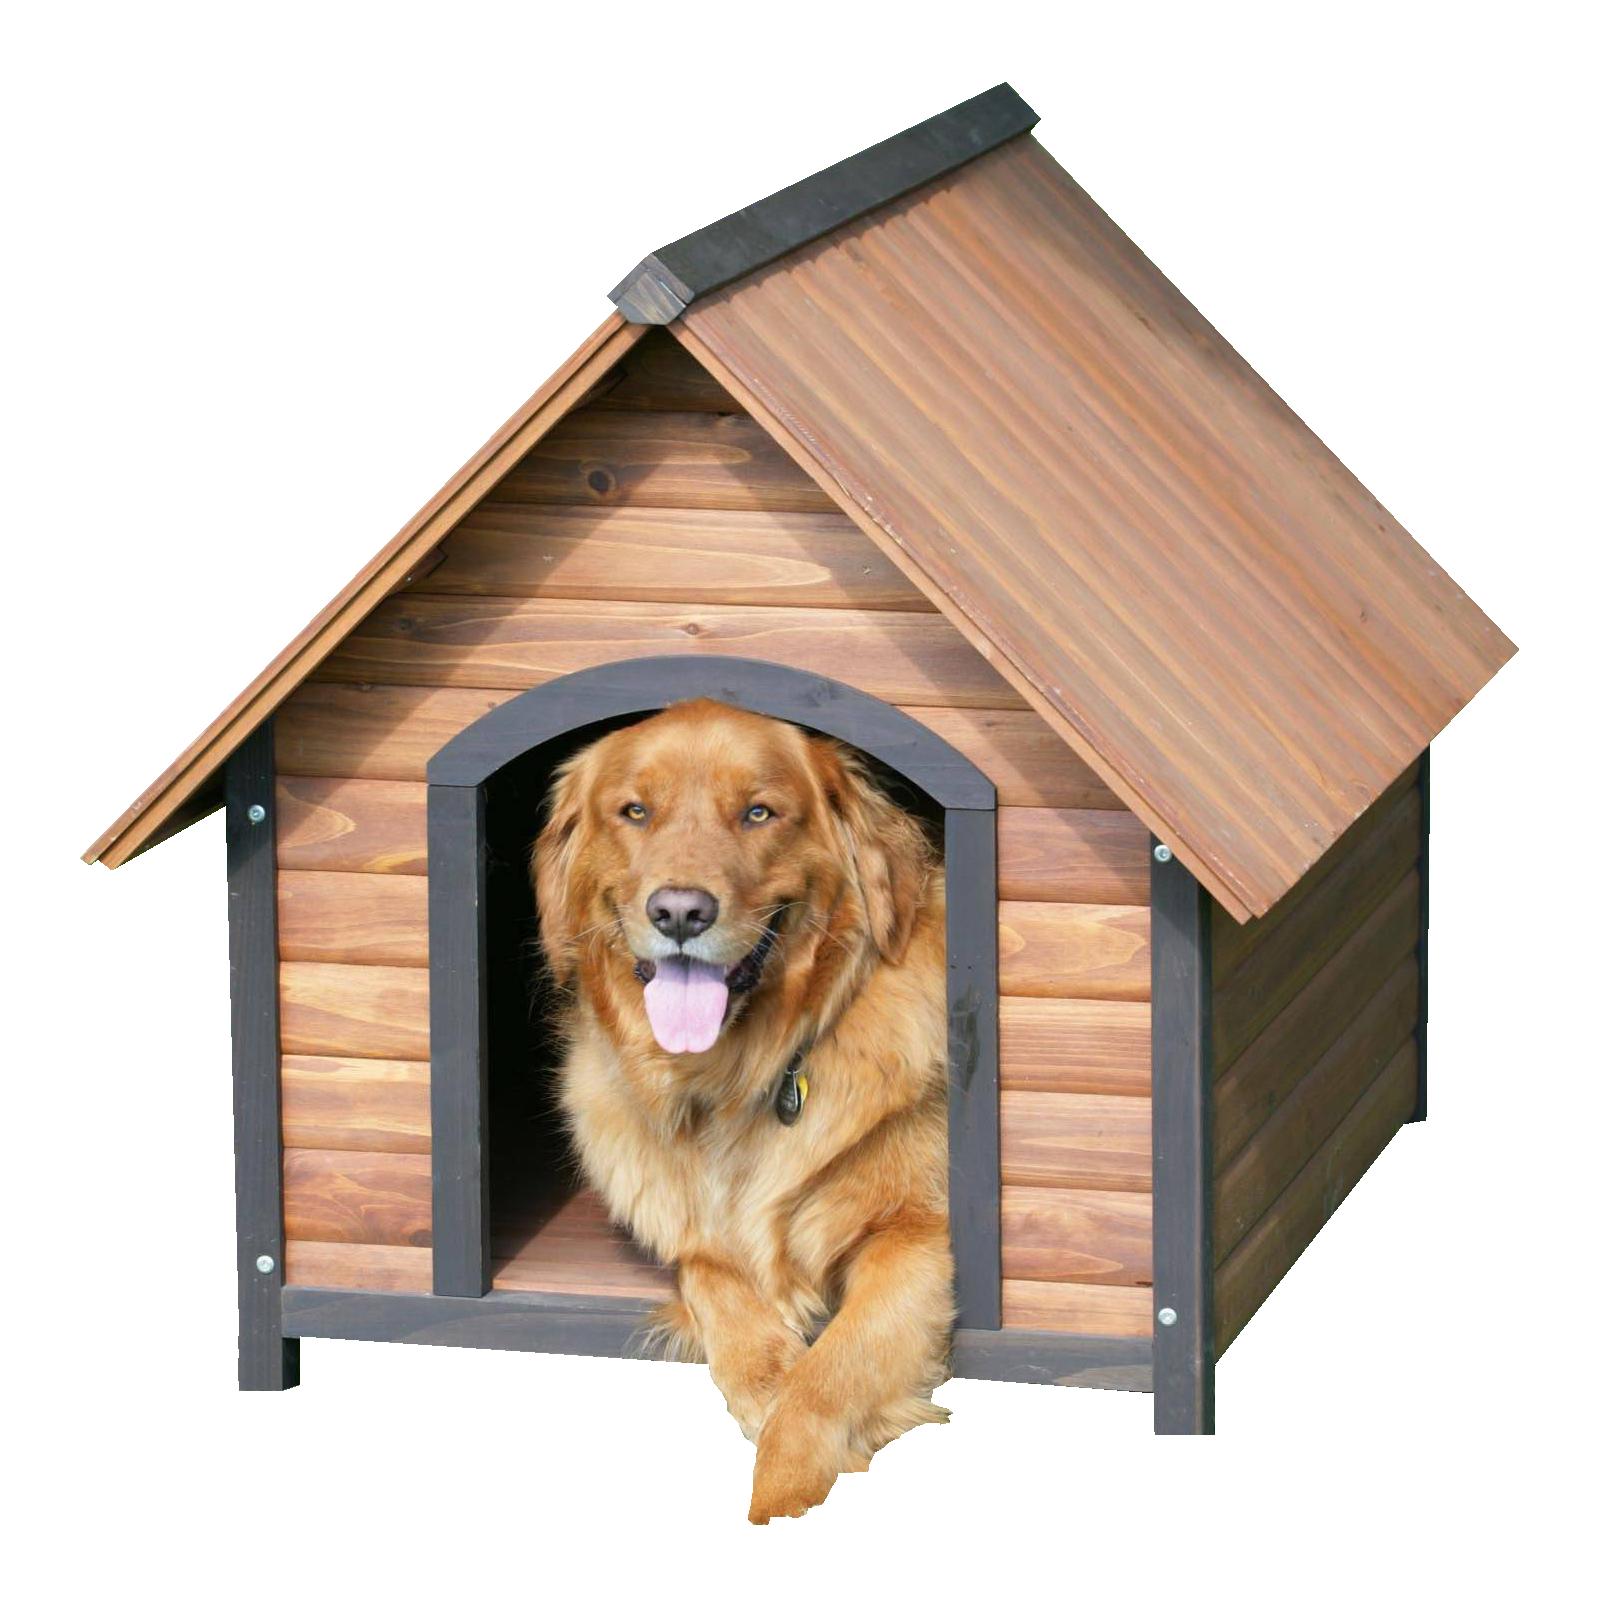 Dog House Png Image Dog House Dogs Animals